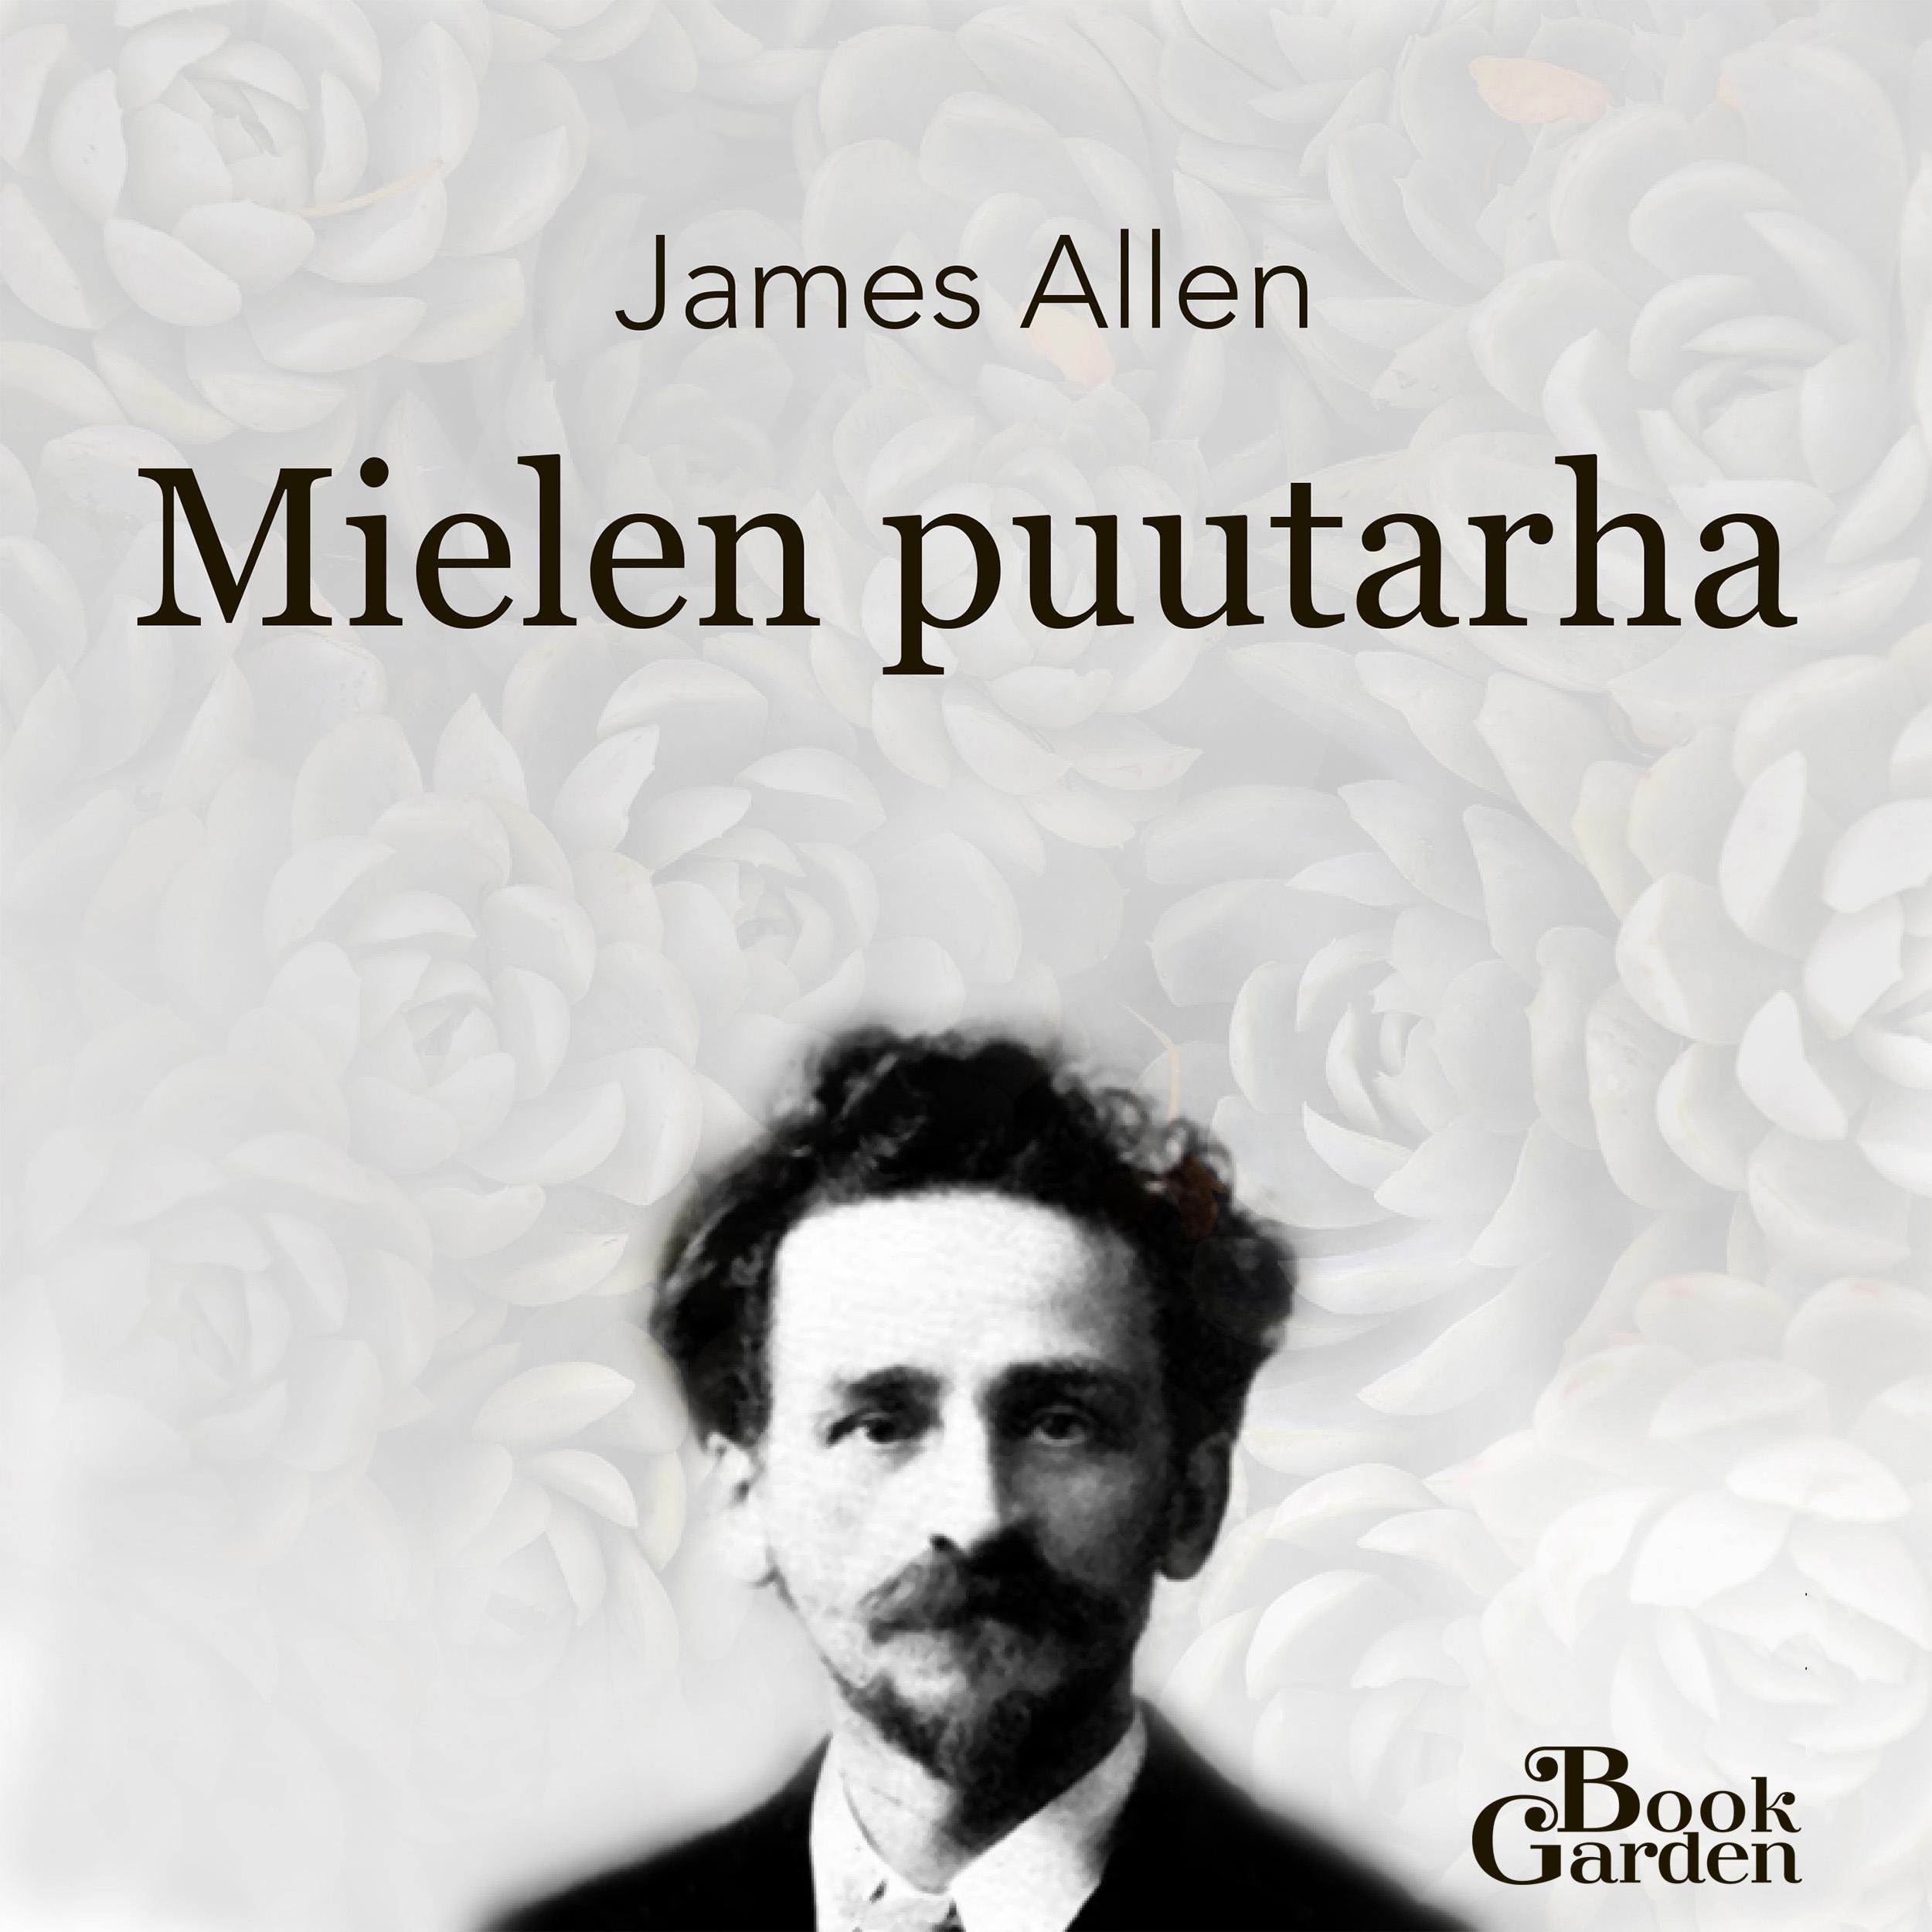 James Allen: Mielen puutarha